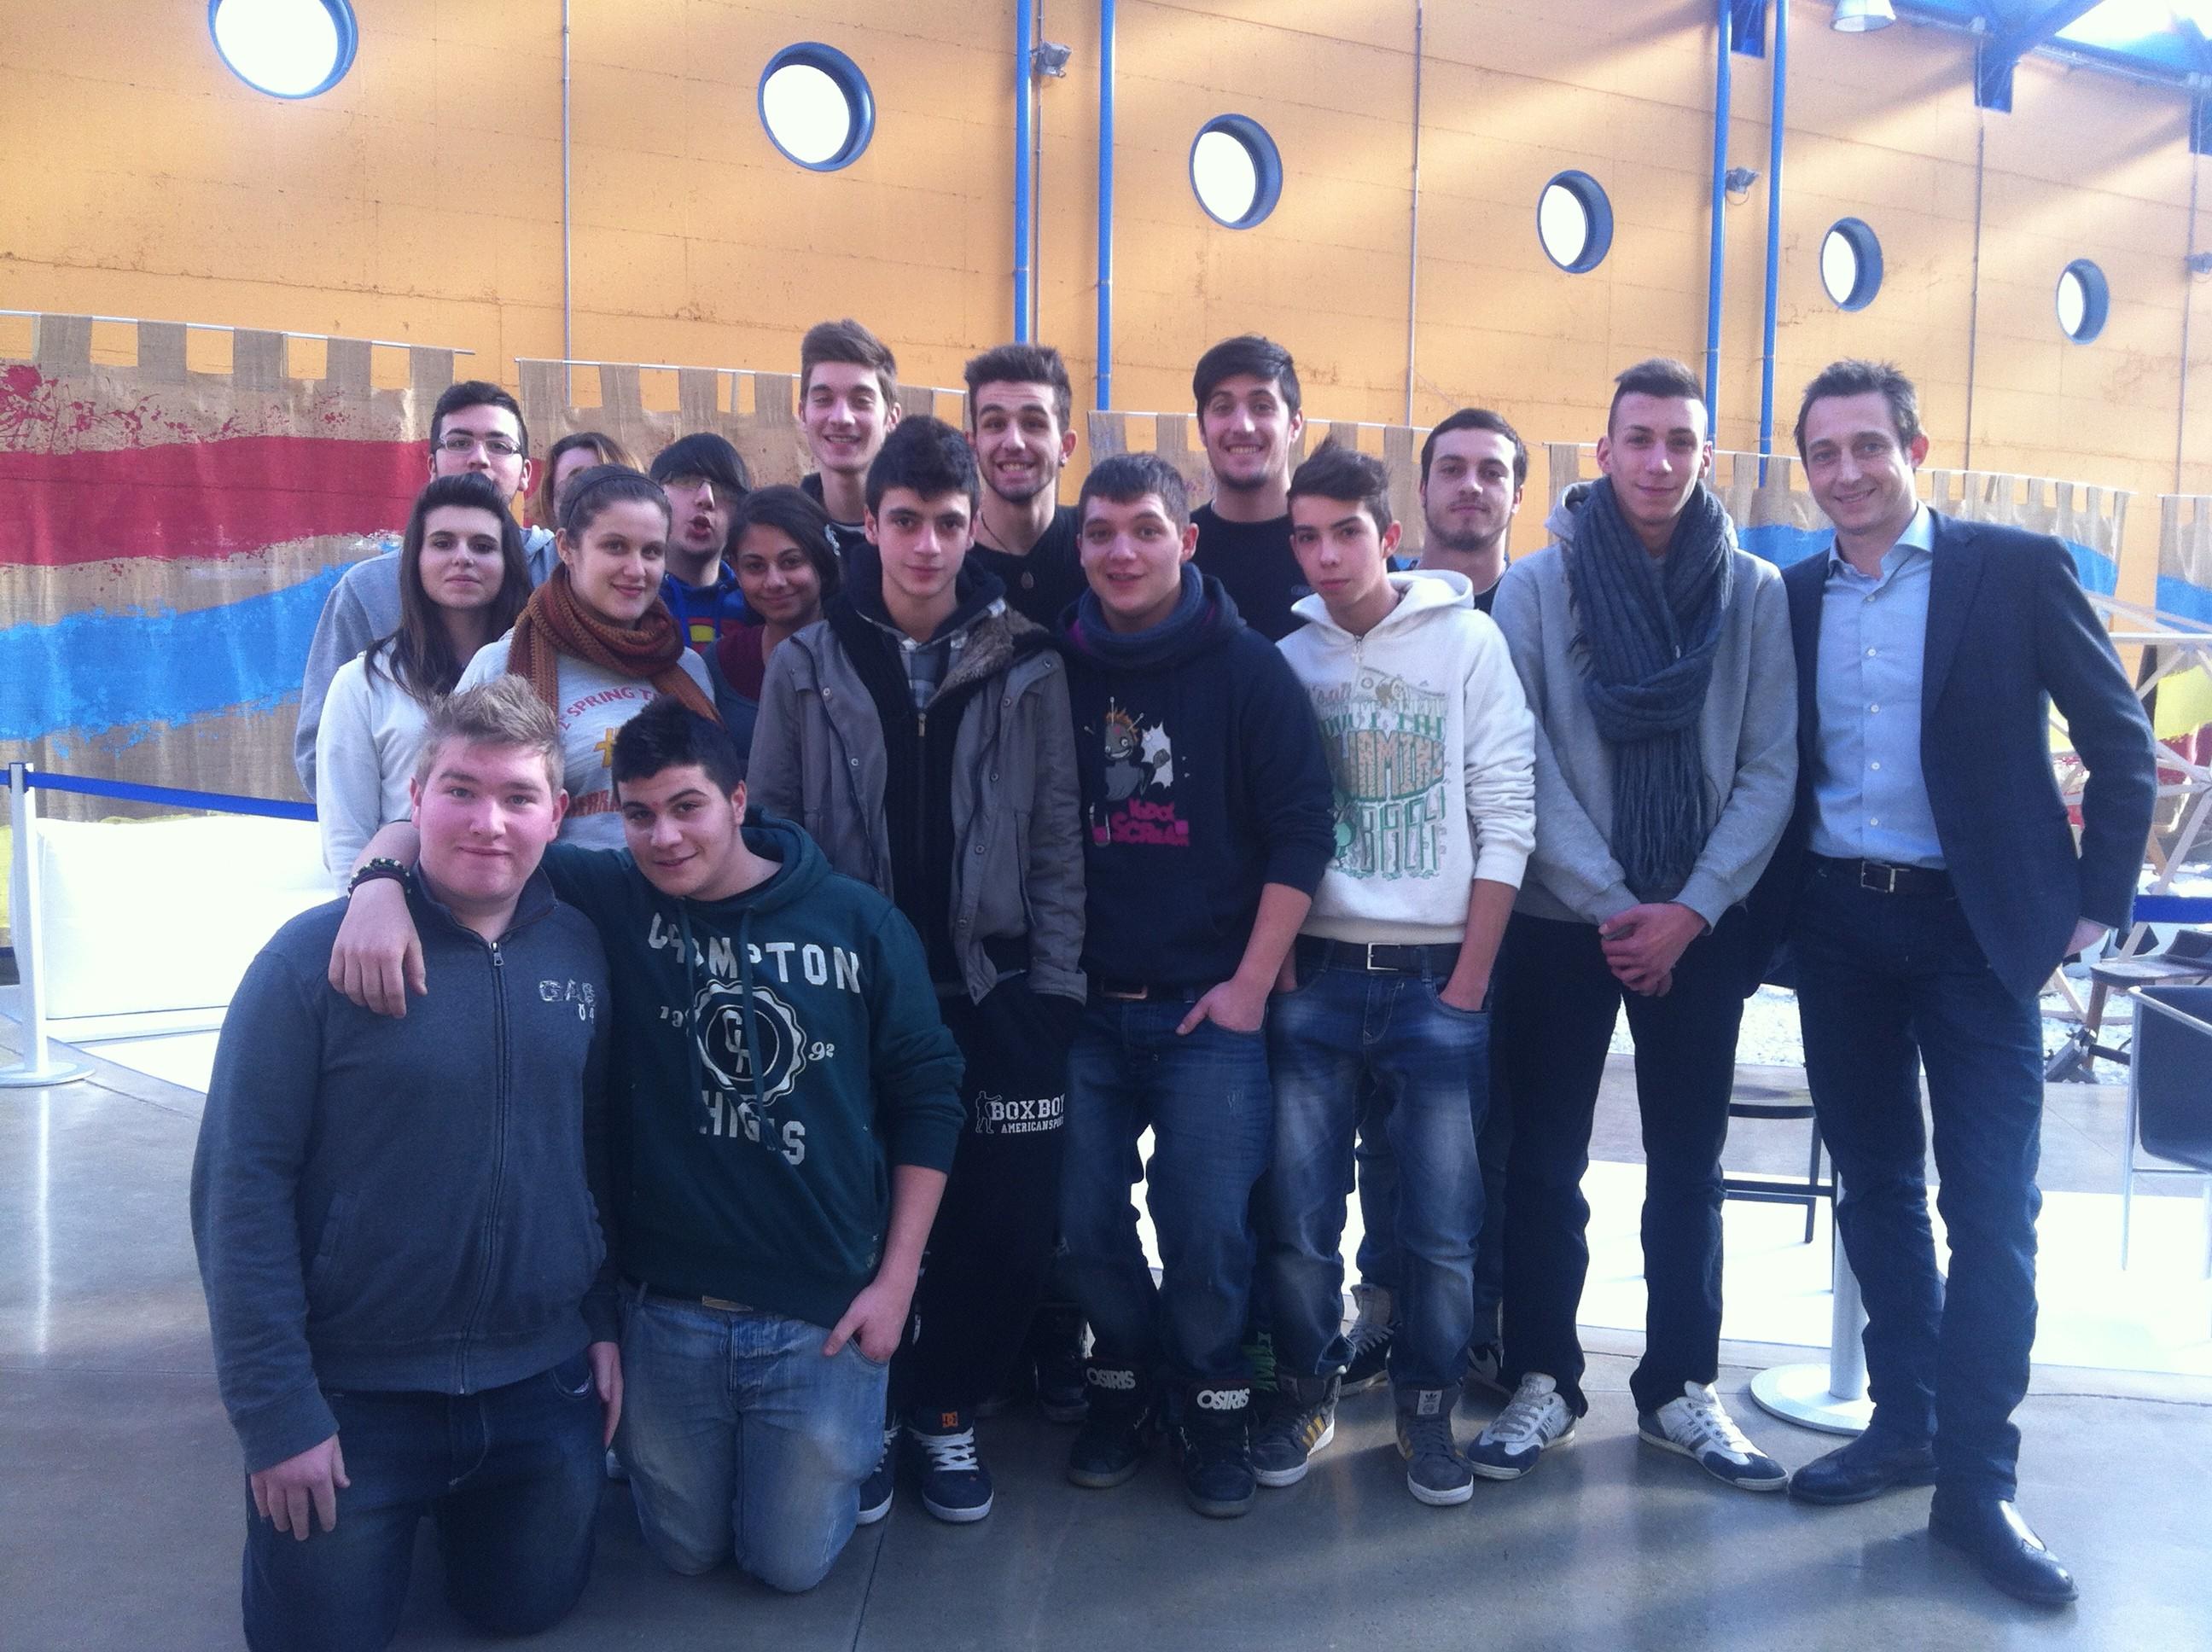 https://blog.bertosalotti.fr/wp-content/uploads/2013/01/scuola-tappezzieri-e1358754242904.jpg